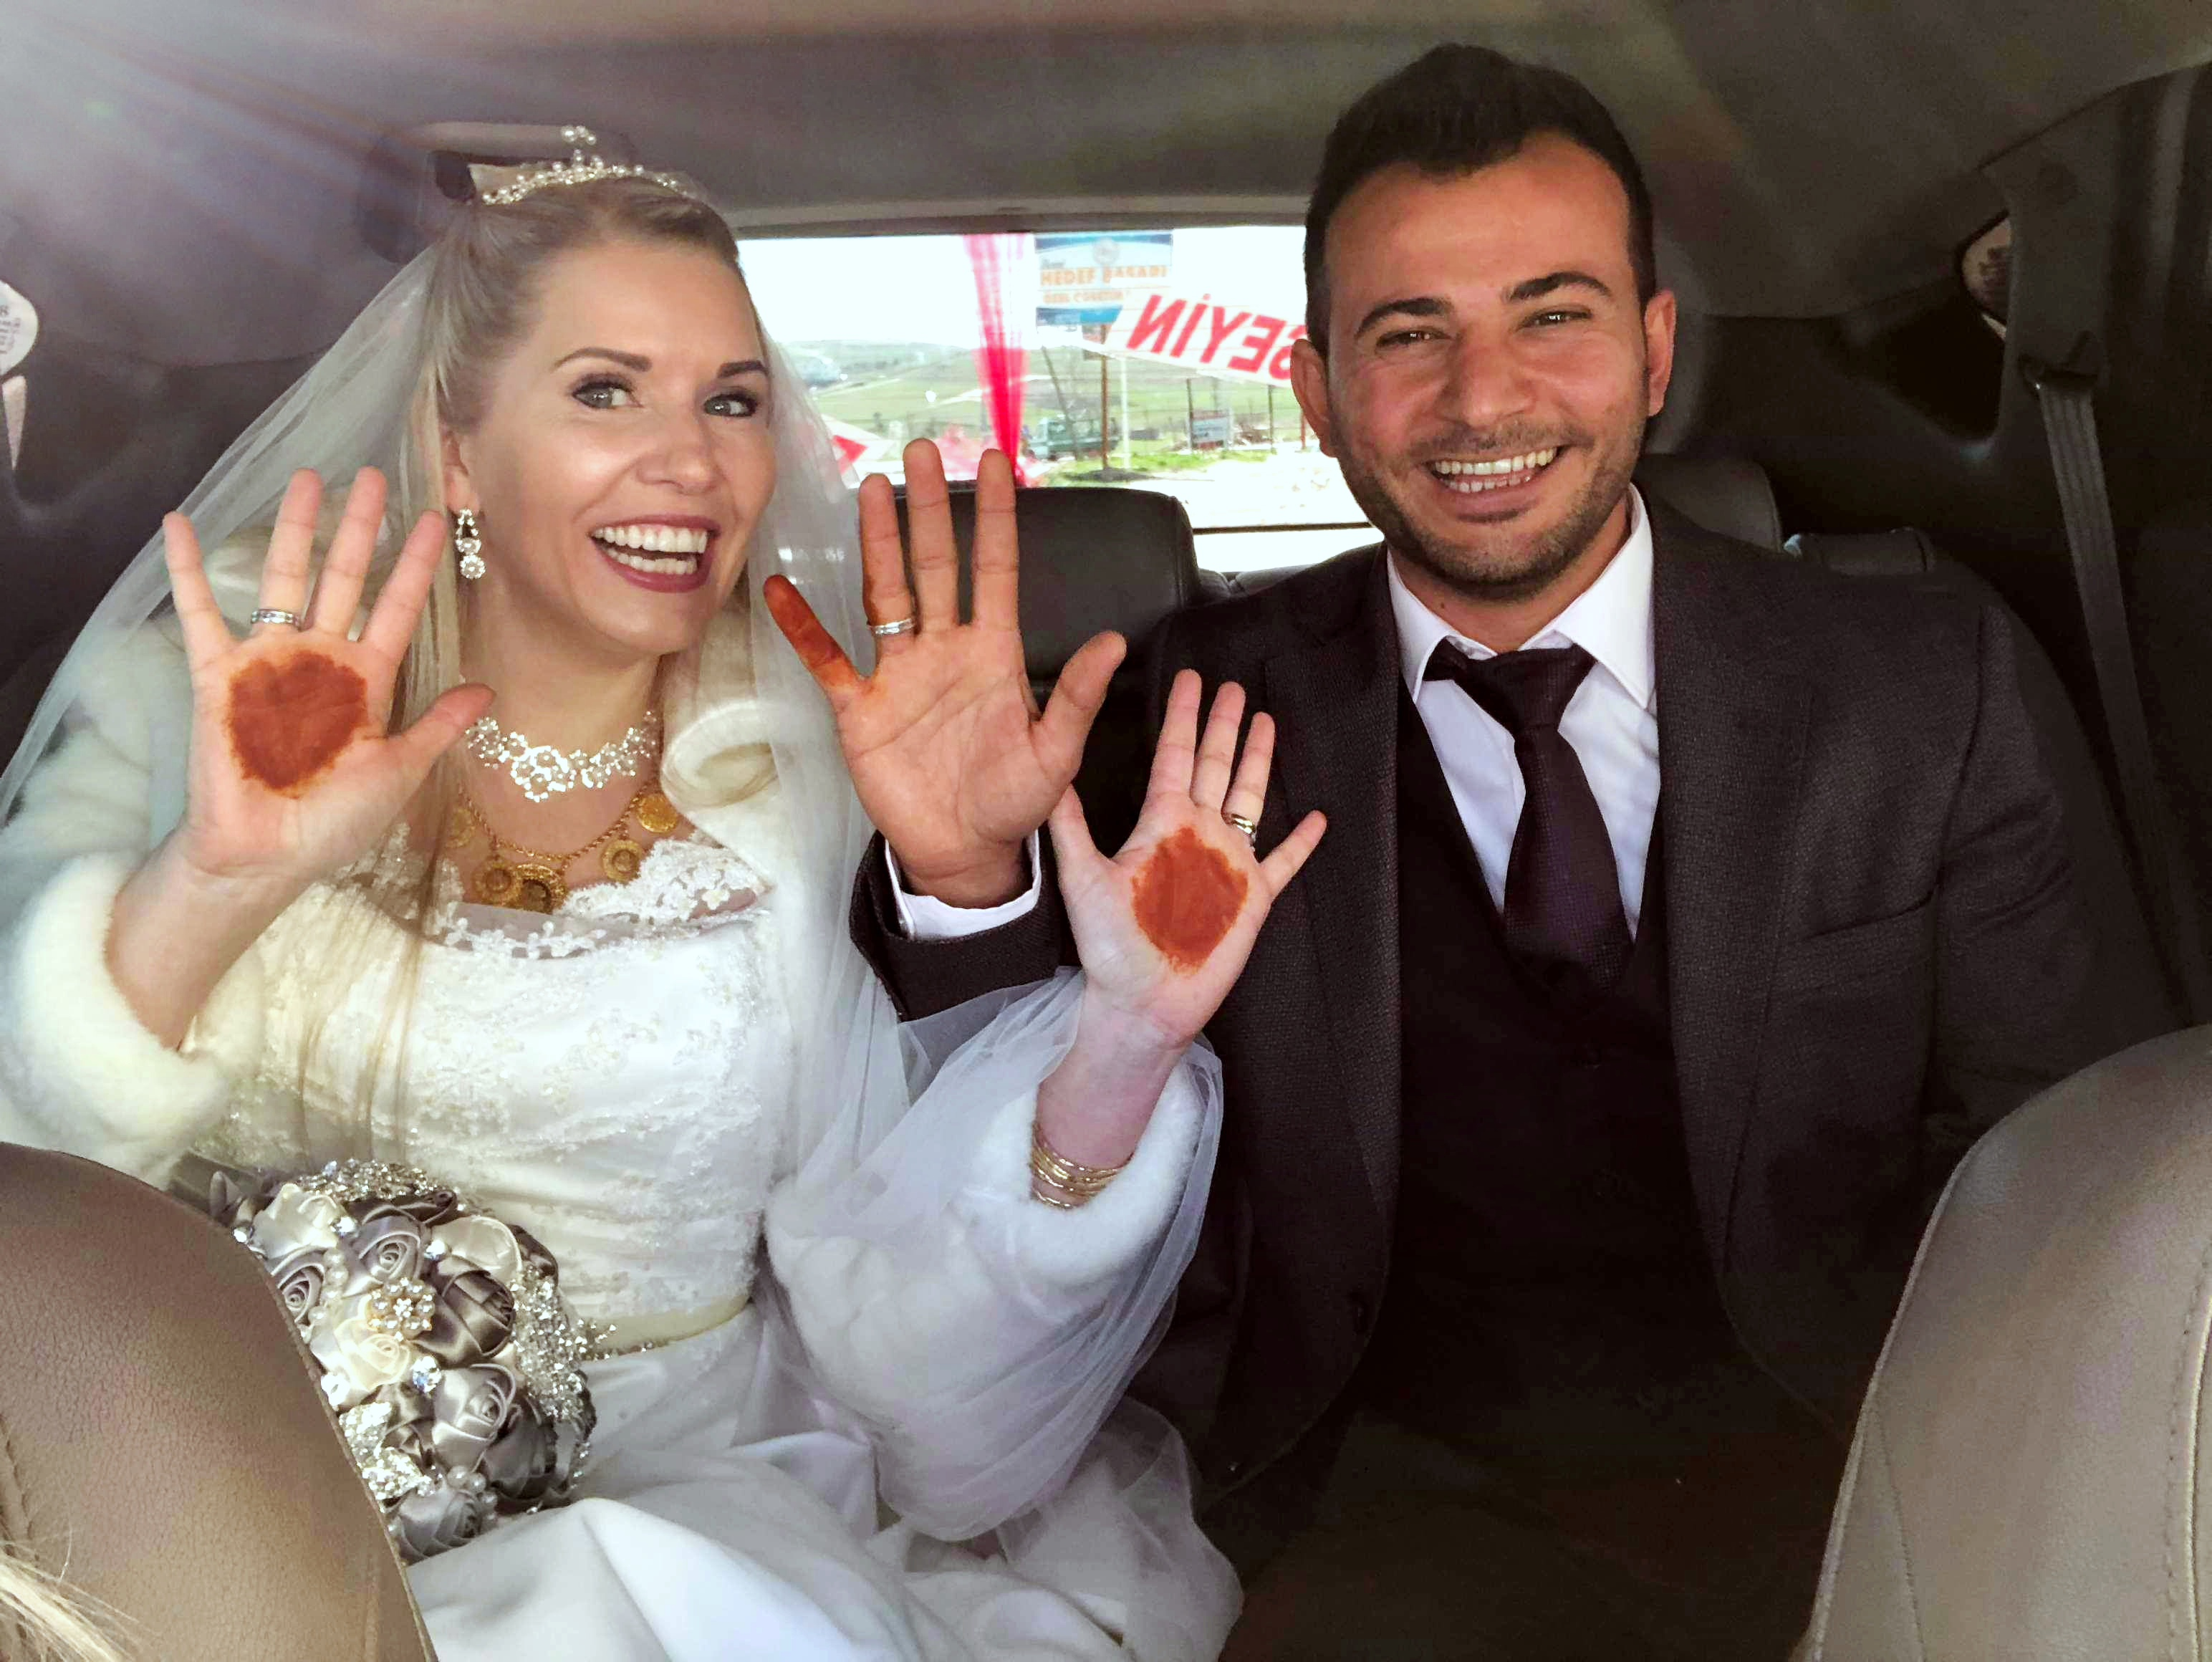 gifte seg i norge med utenlandsk statsborger